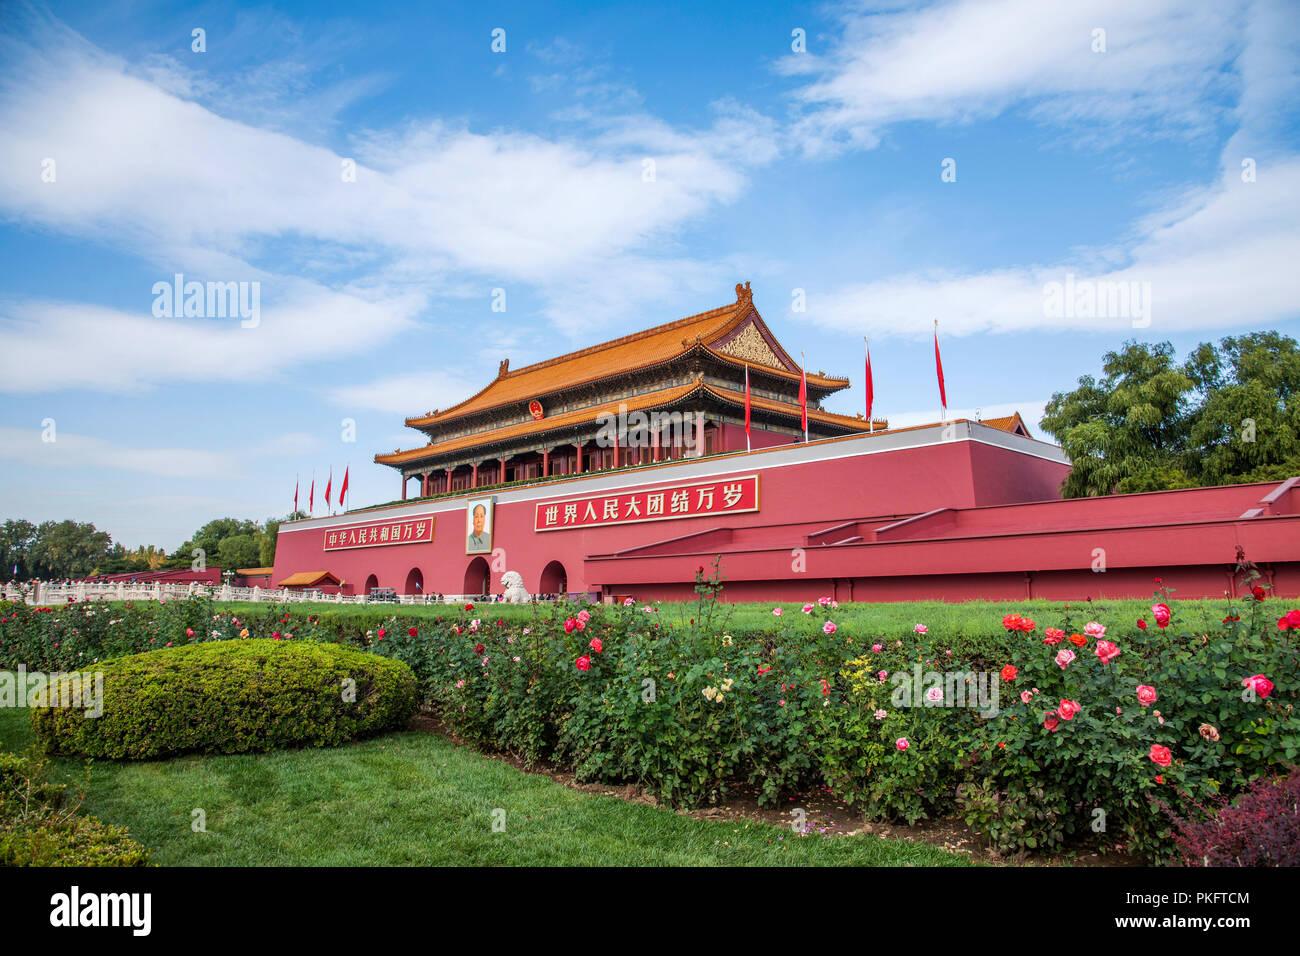 Beijing's tiananmen square - Stock Image